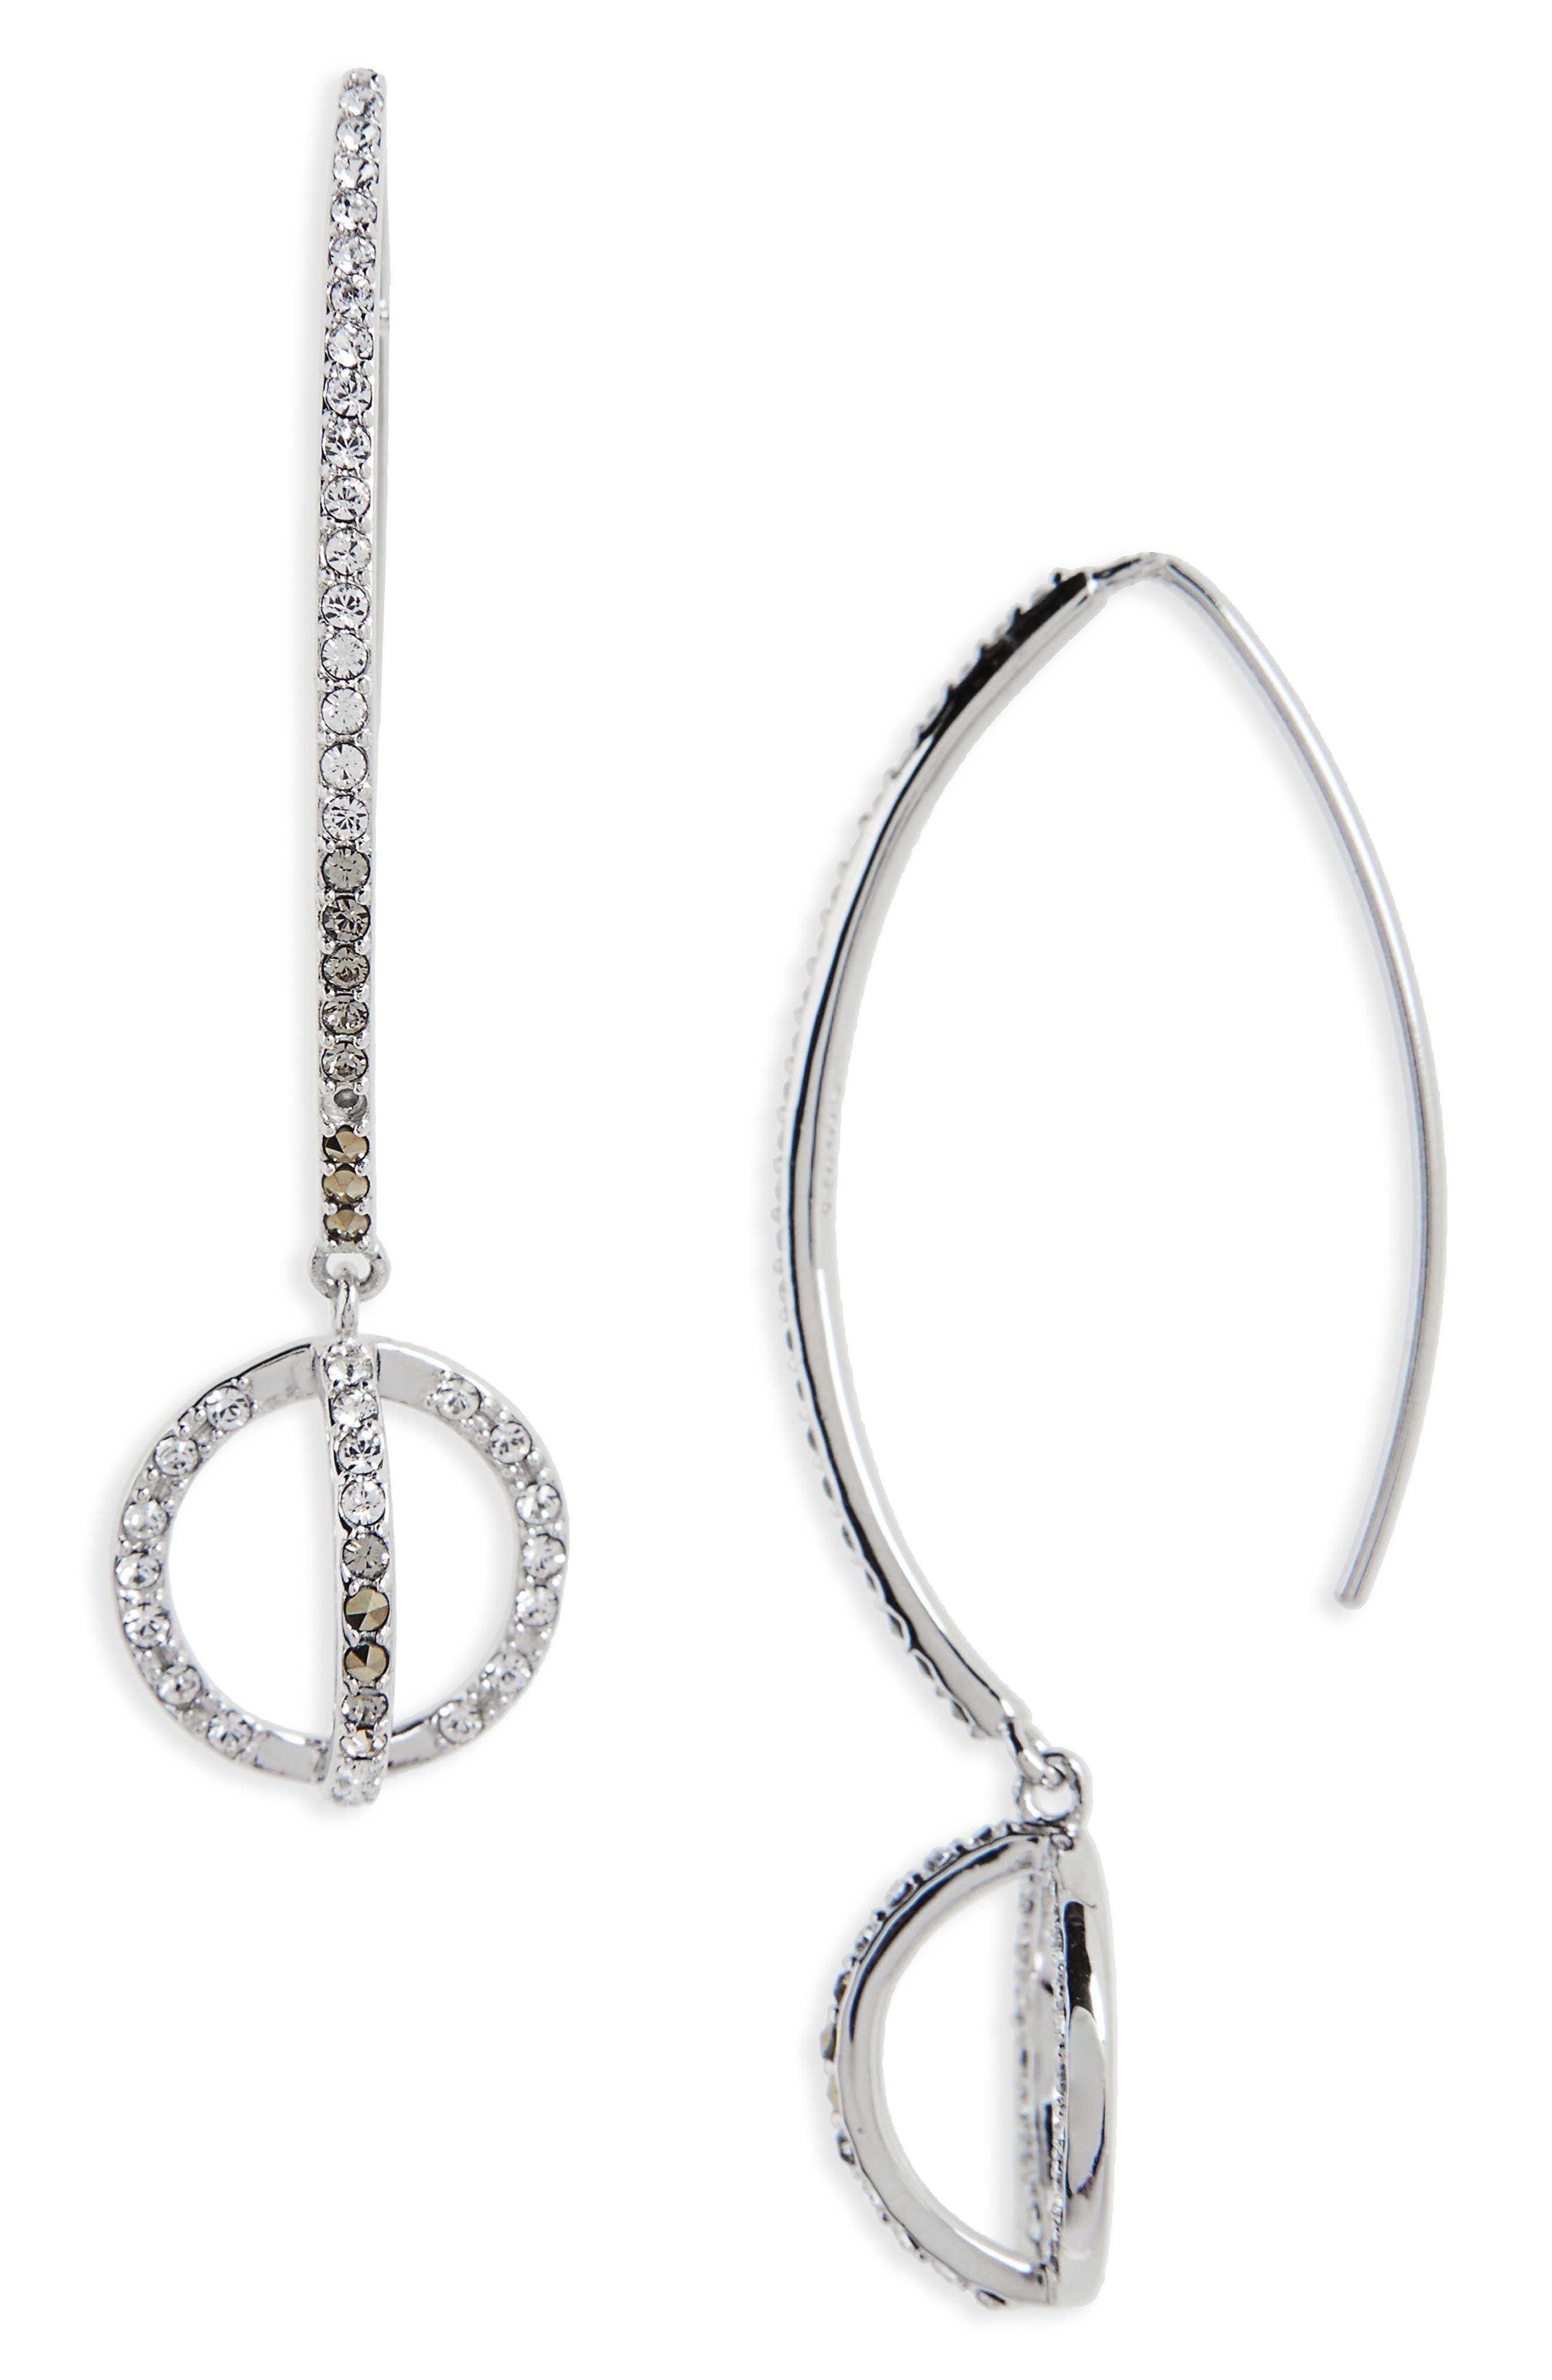 Silver Sparkle Threader Earrings,                         Main,                         color, Black Diamond/ Marcasite